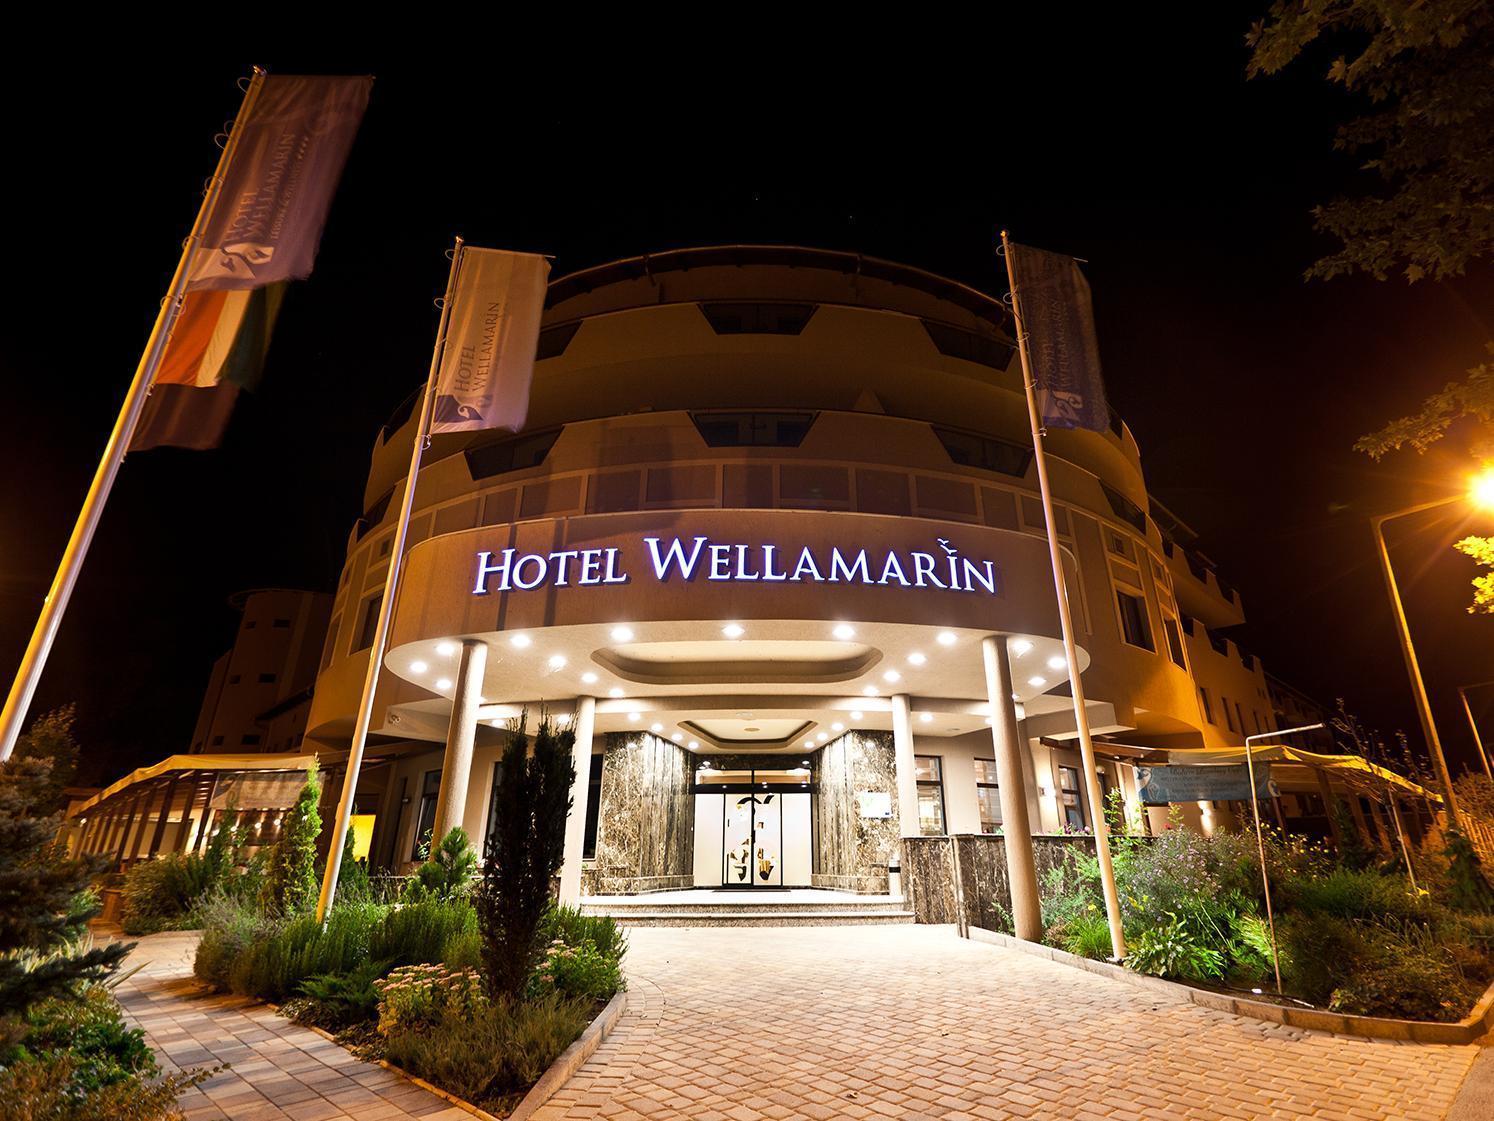 Hotel Wellamarin Leisure and Wellness